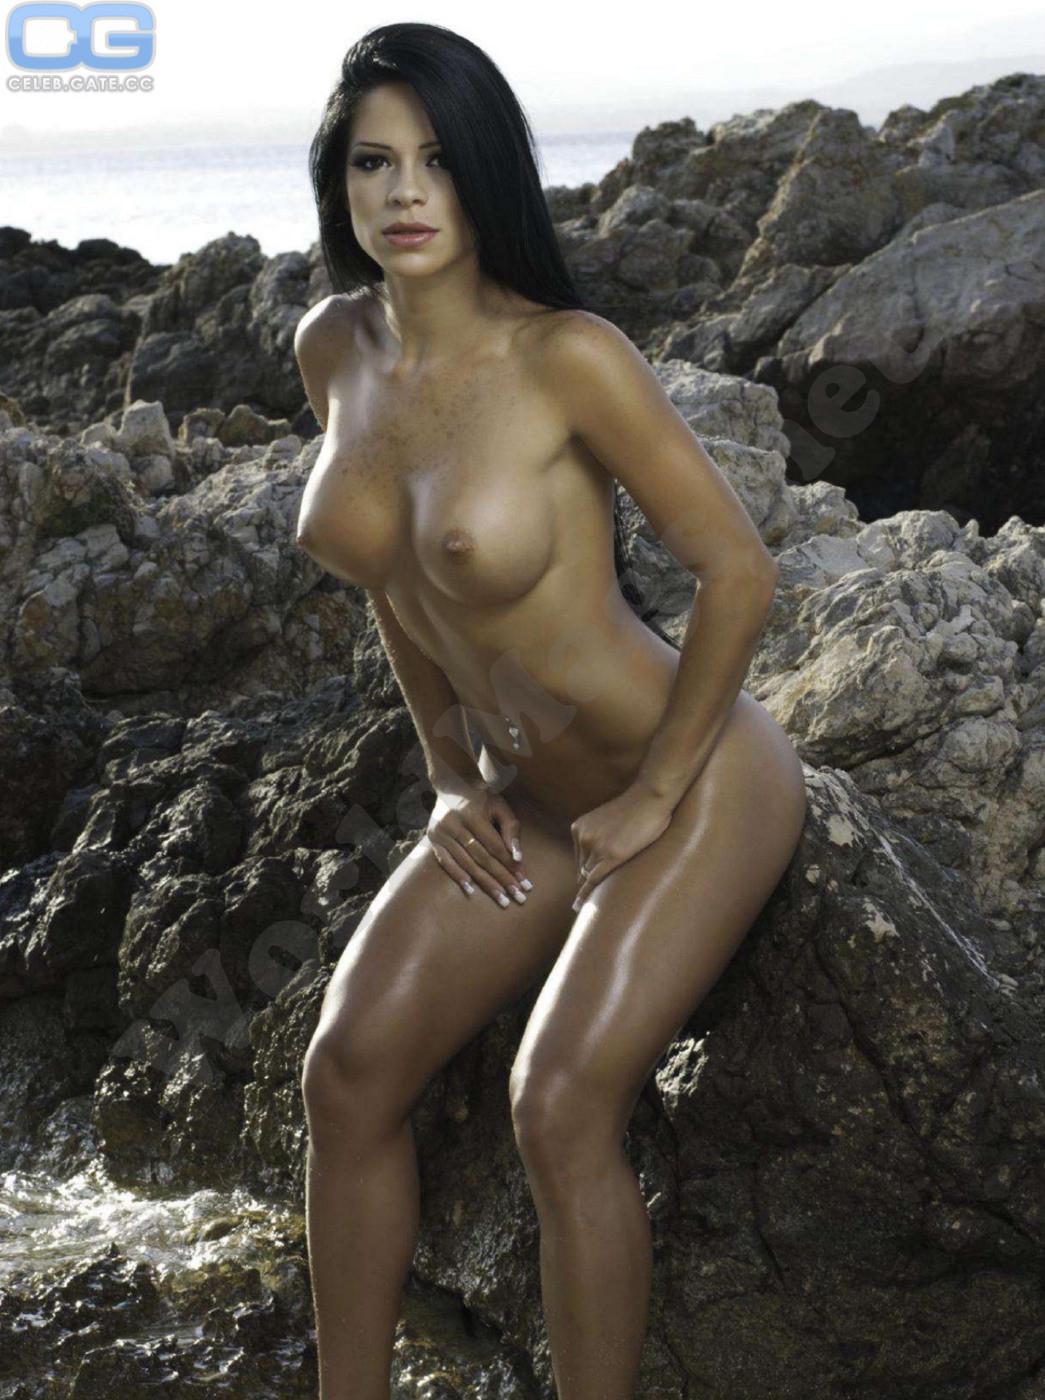 nackt Monballijn Michelle naakt